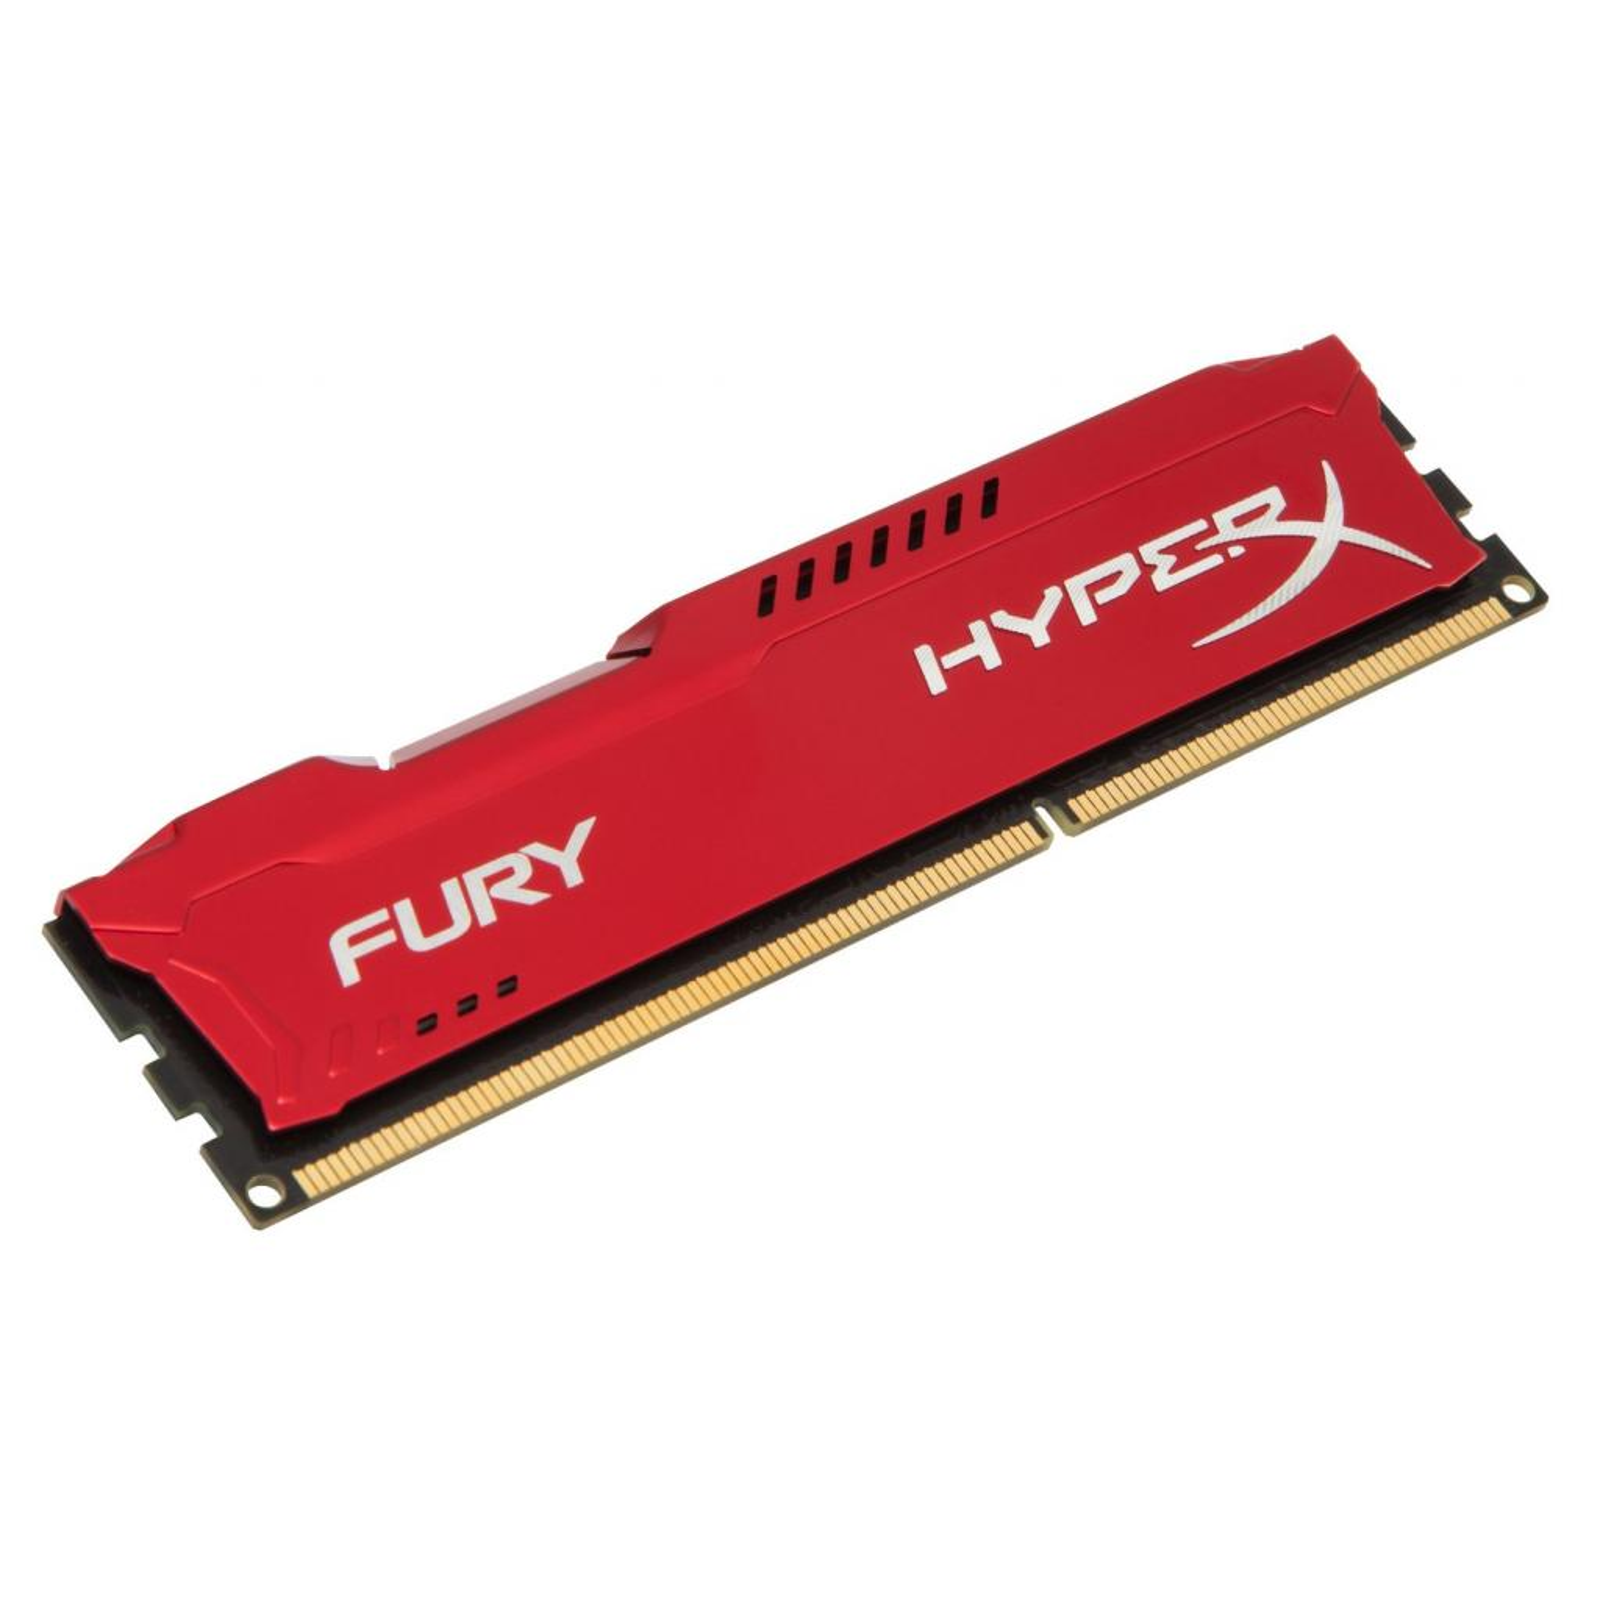 Модуль памяти для компьютера DDR3 8Gb 1600 MHz HyperX Fury Red Kingston (HX316C10FR/8) изображение 2